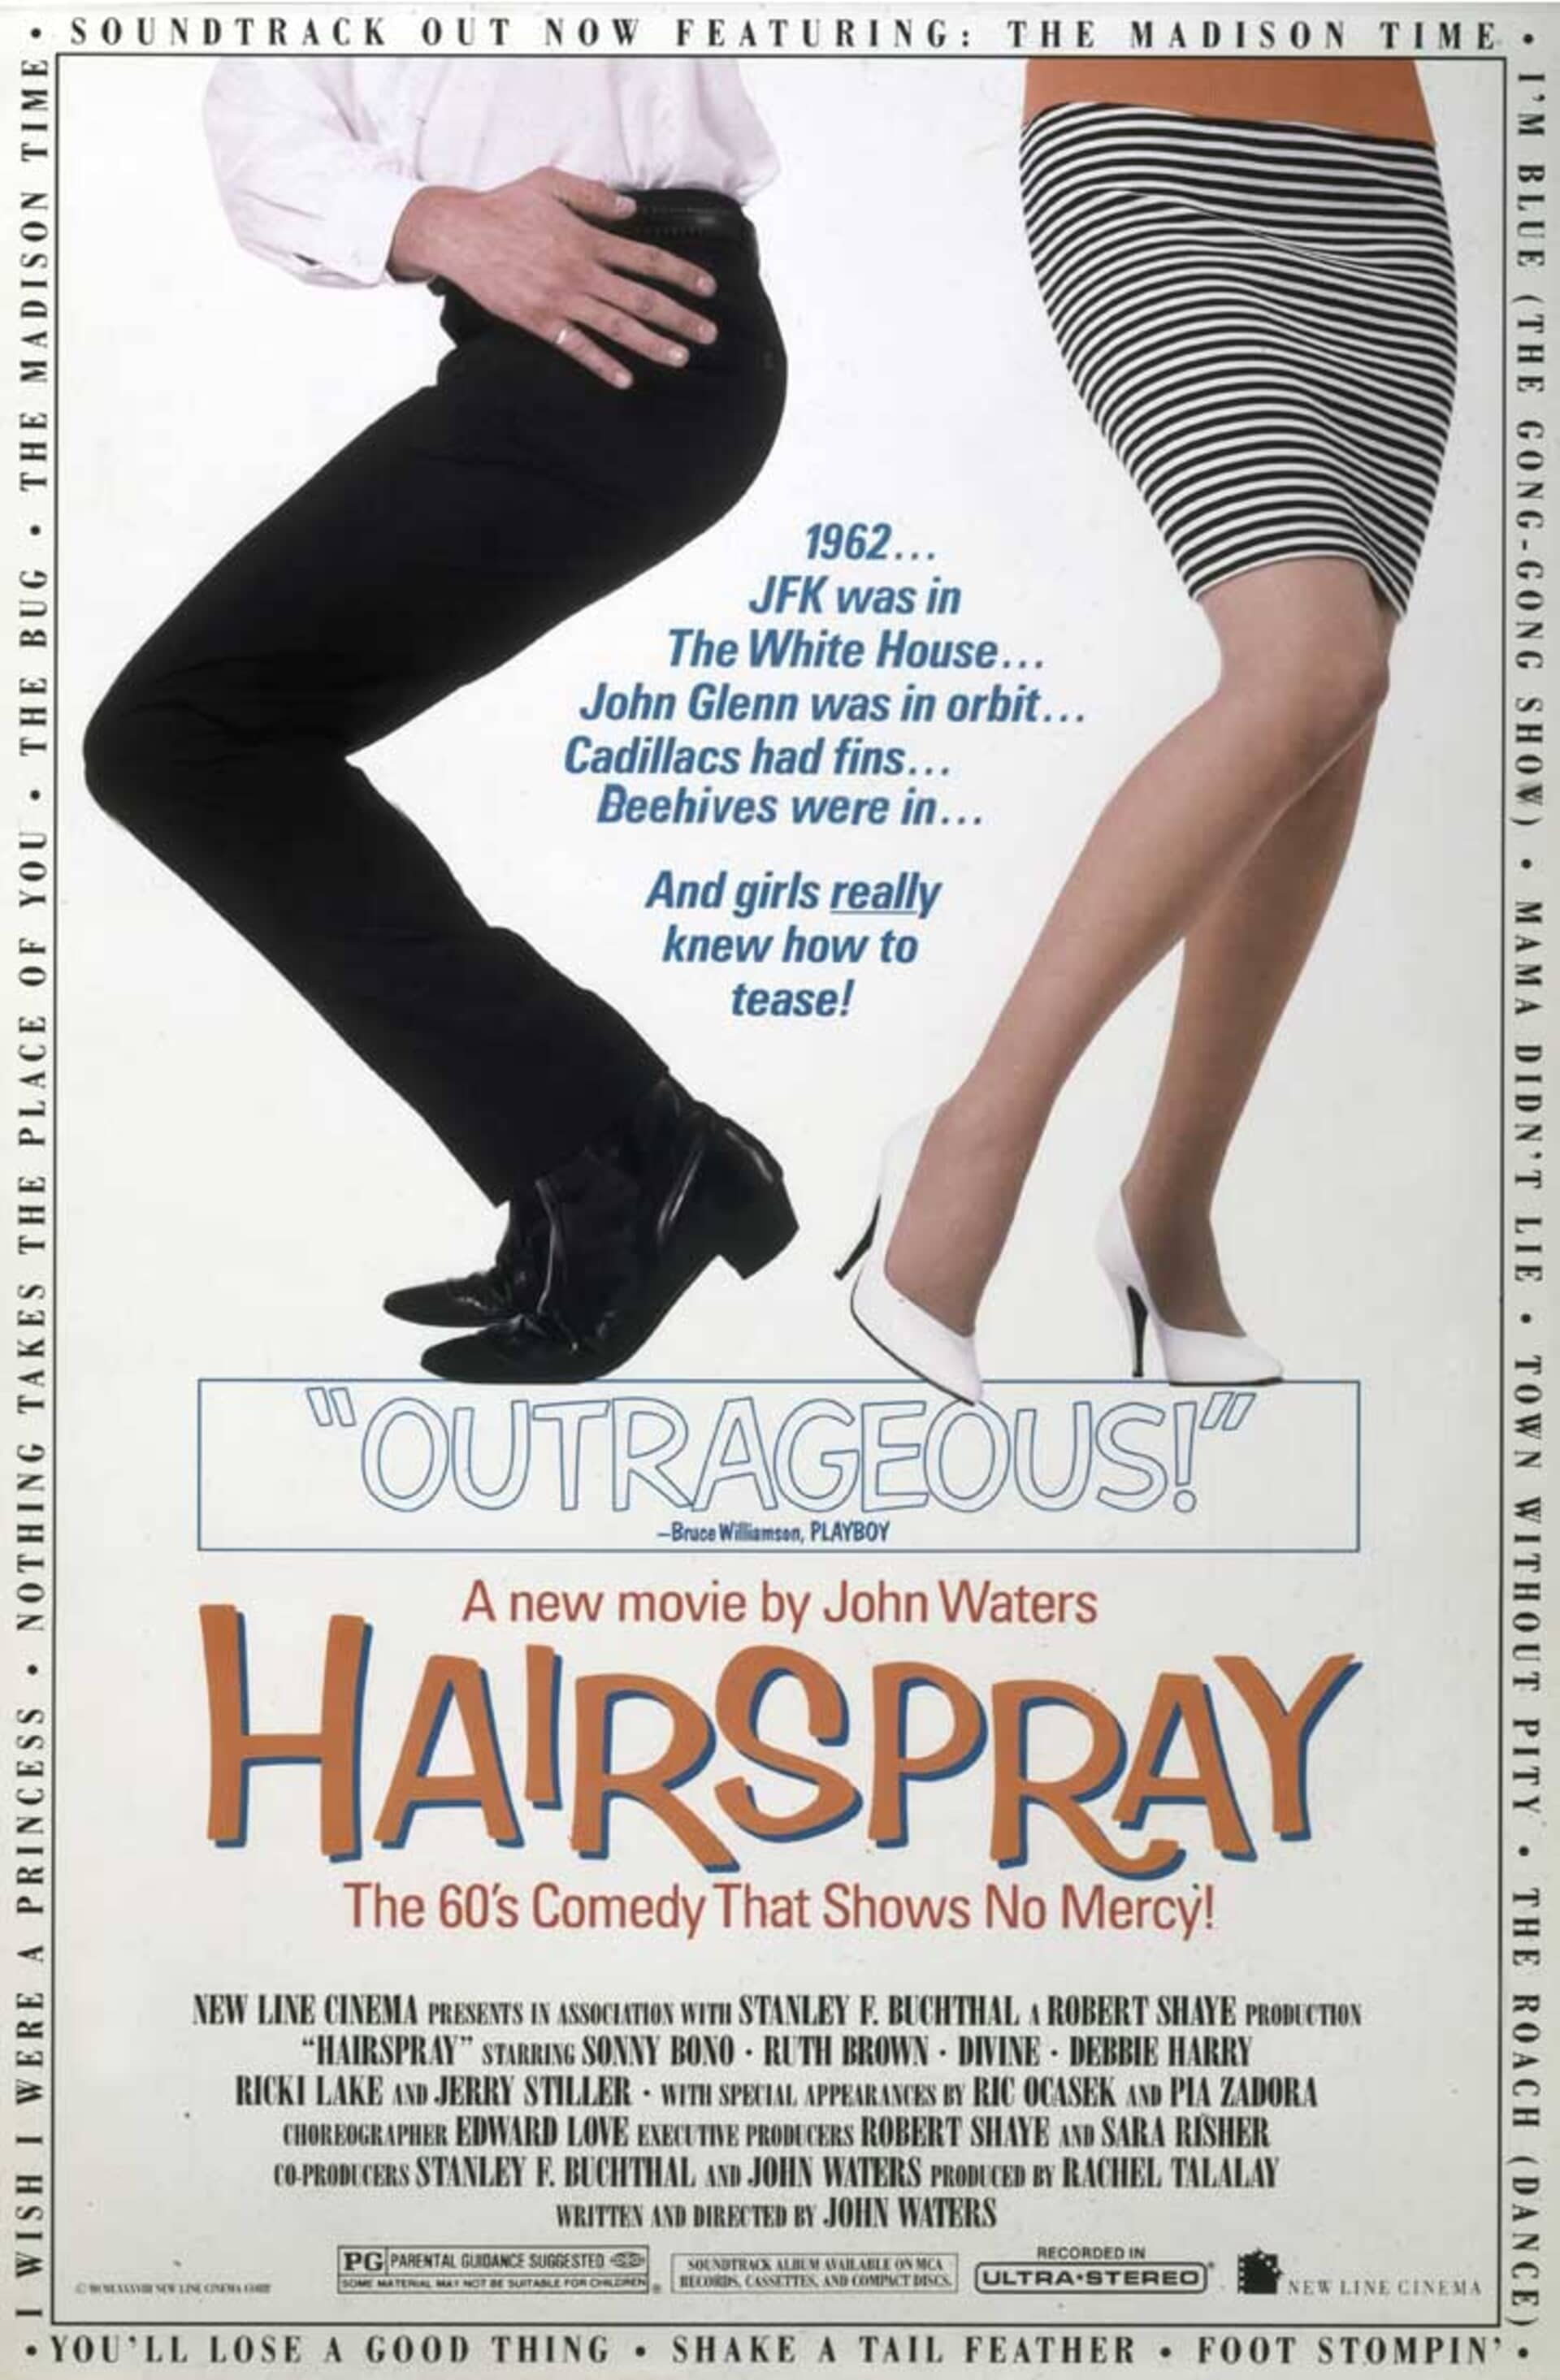 Hairspray (1988) - Poster 1